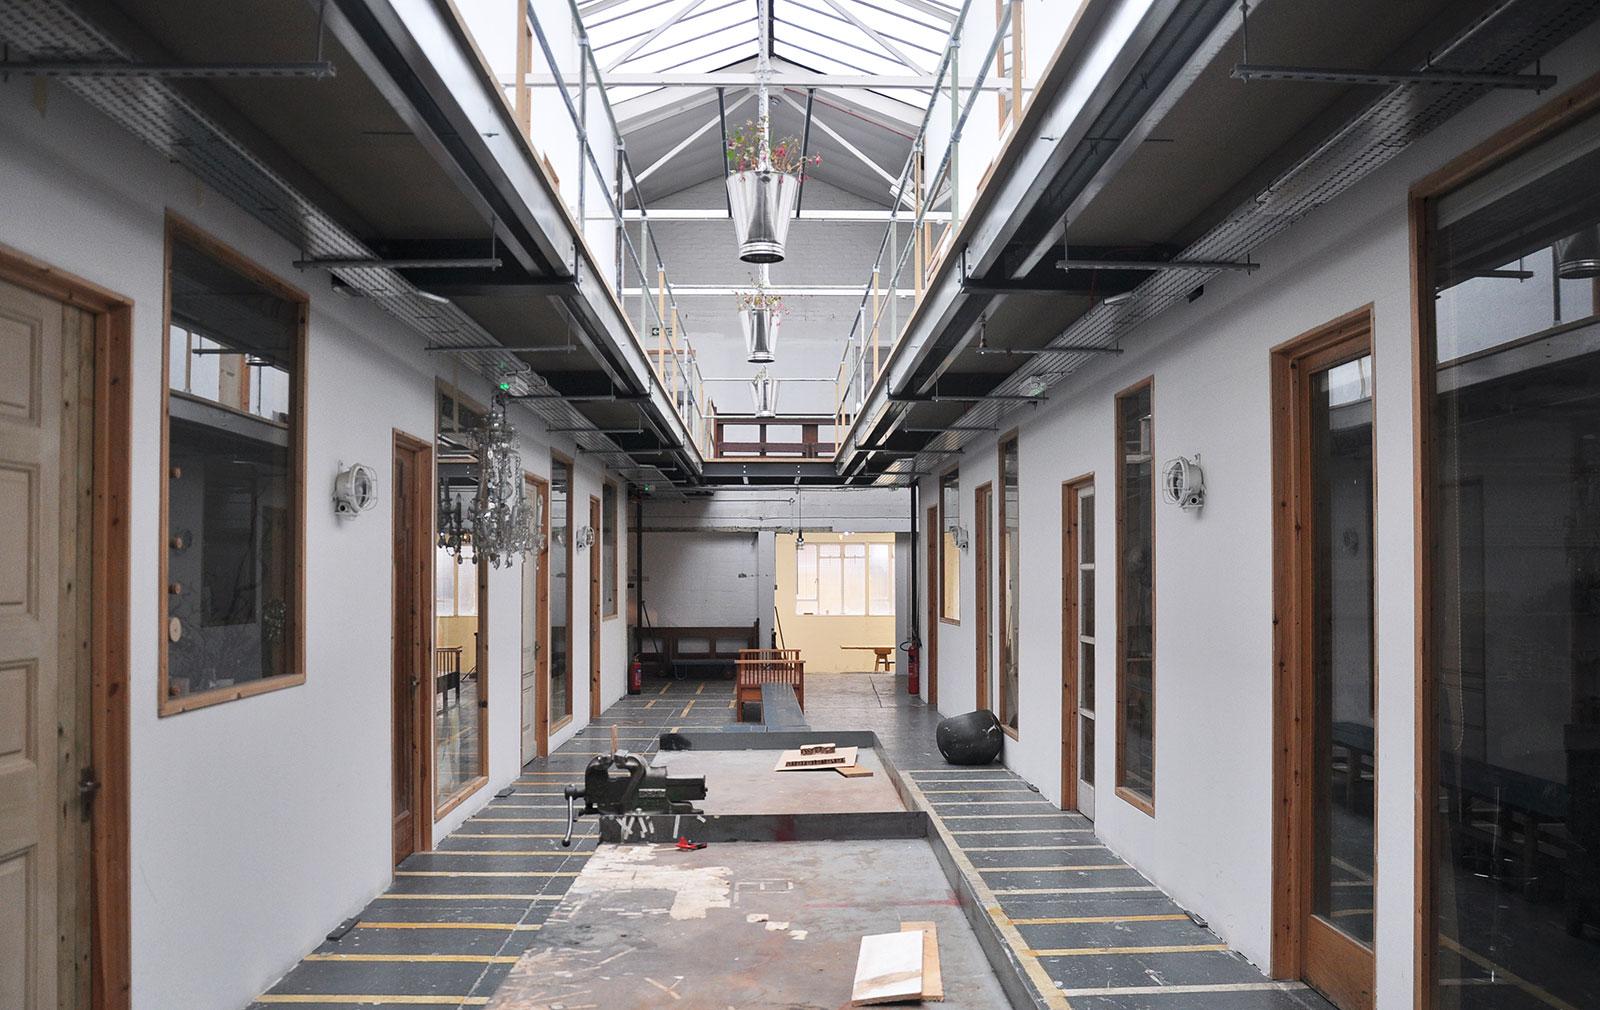 Henry Krokatsis' studio space